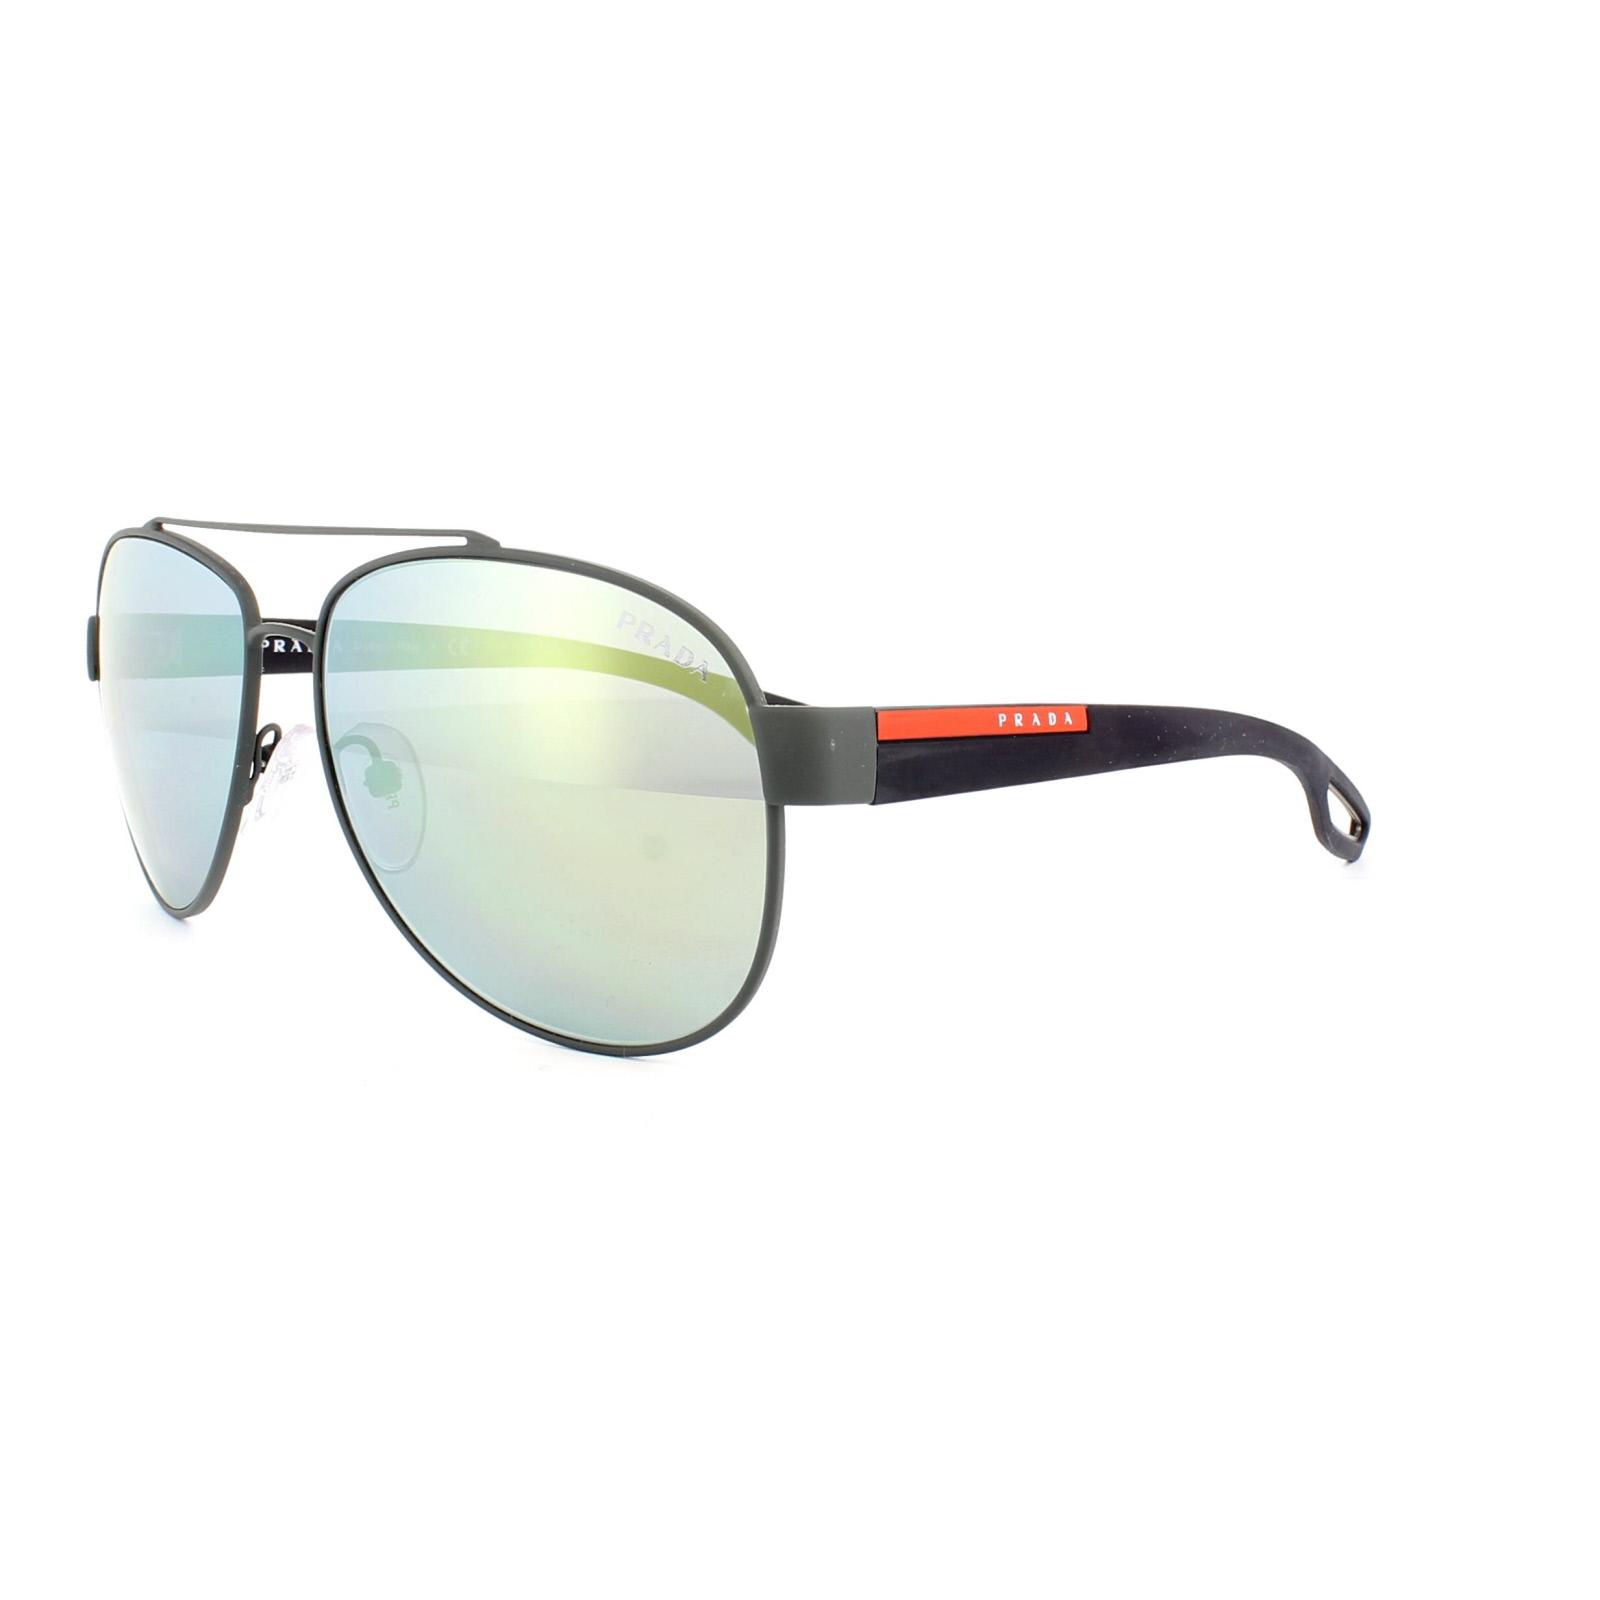 5f0c4e245623 Sentinel Prada Sport Sunglasses 55QS TIG4J2 Grey Rubber Emerald Iridium